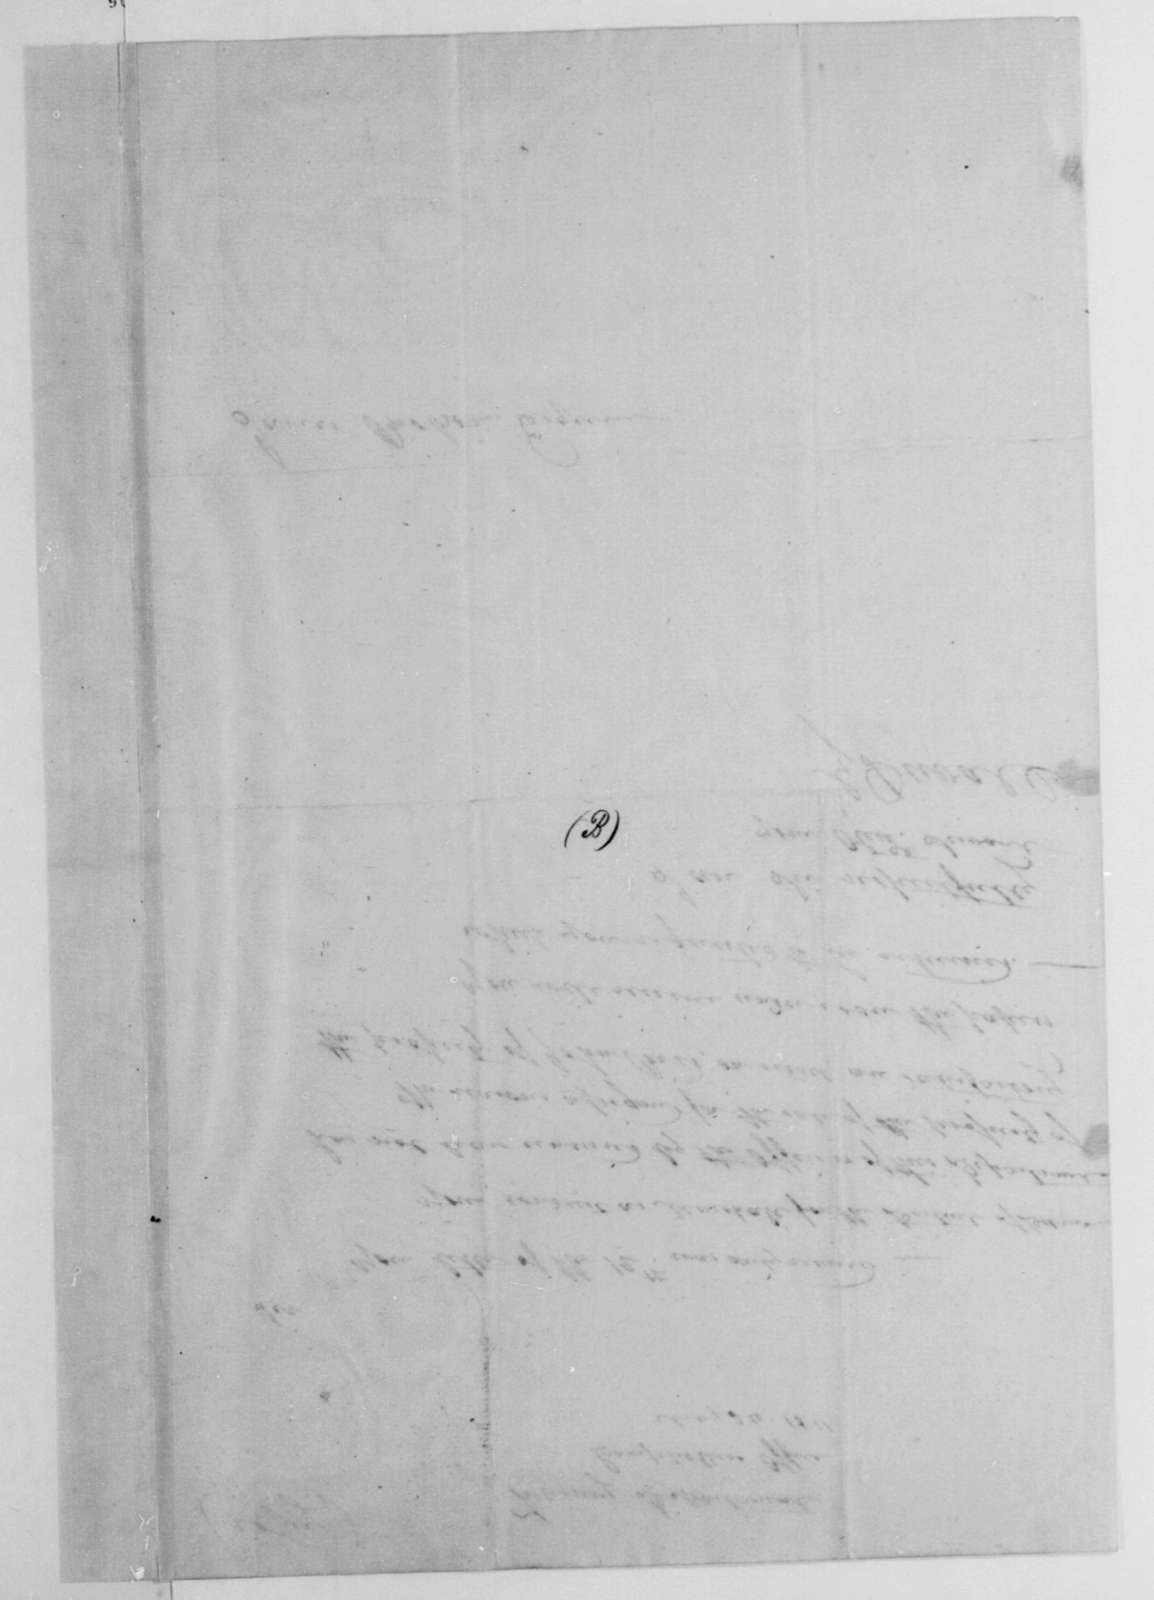 Gabriel Duvall to James Brobson, May 24, 1811.